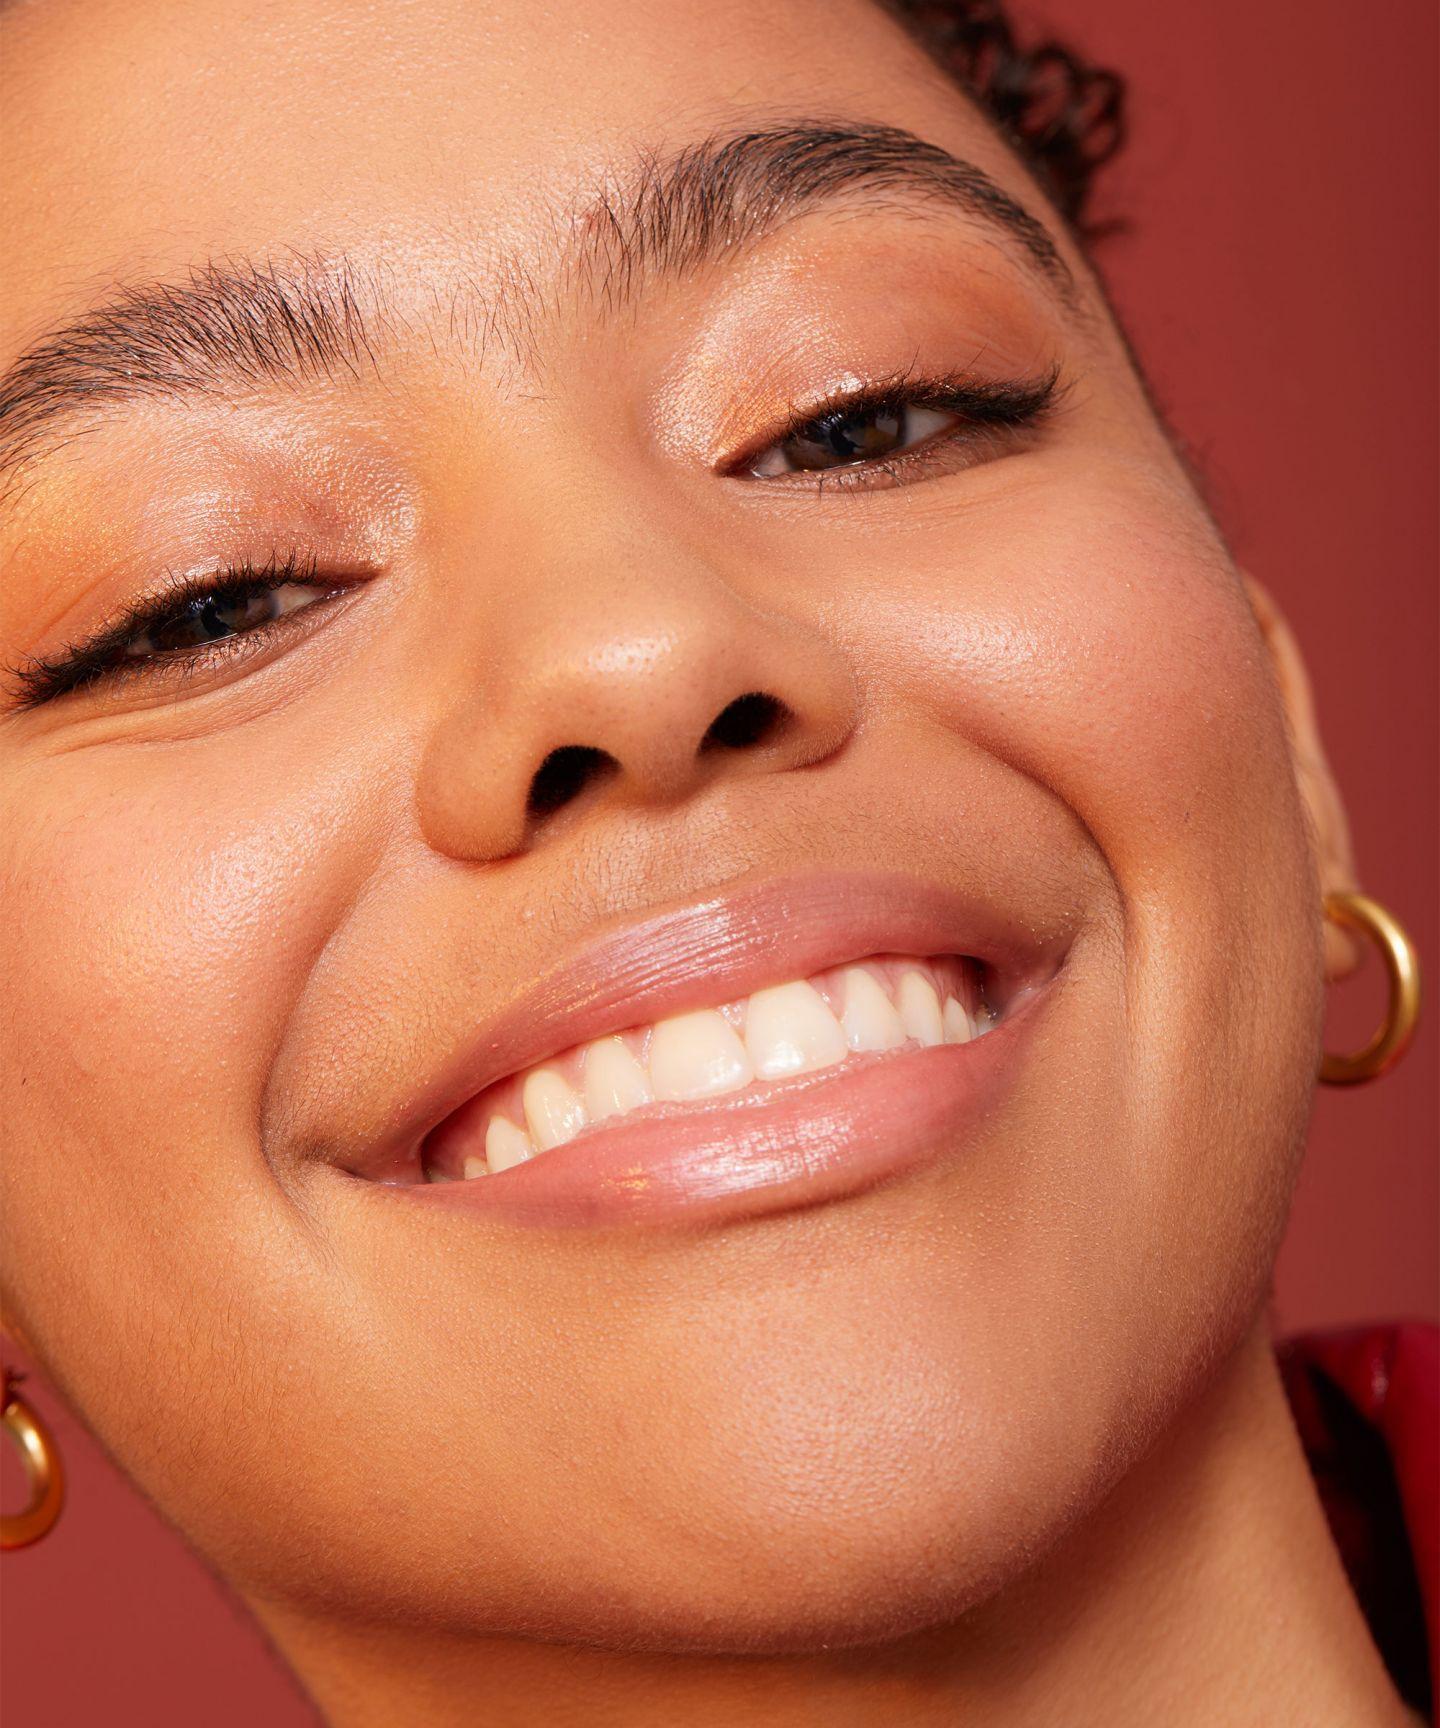 Texture Reform Gentle Resurfacing Serum Skin care